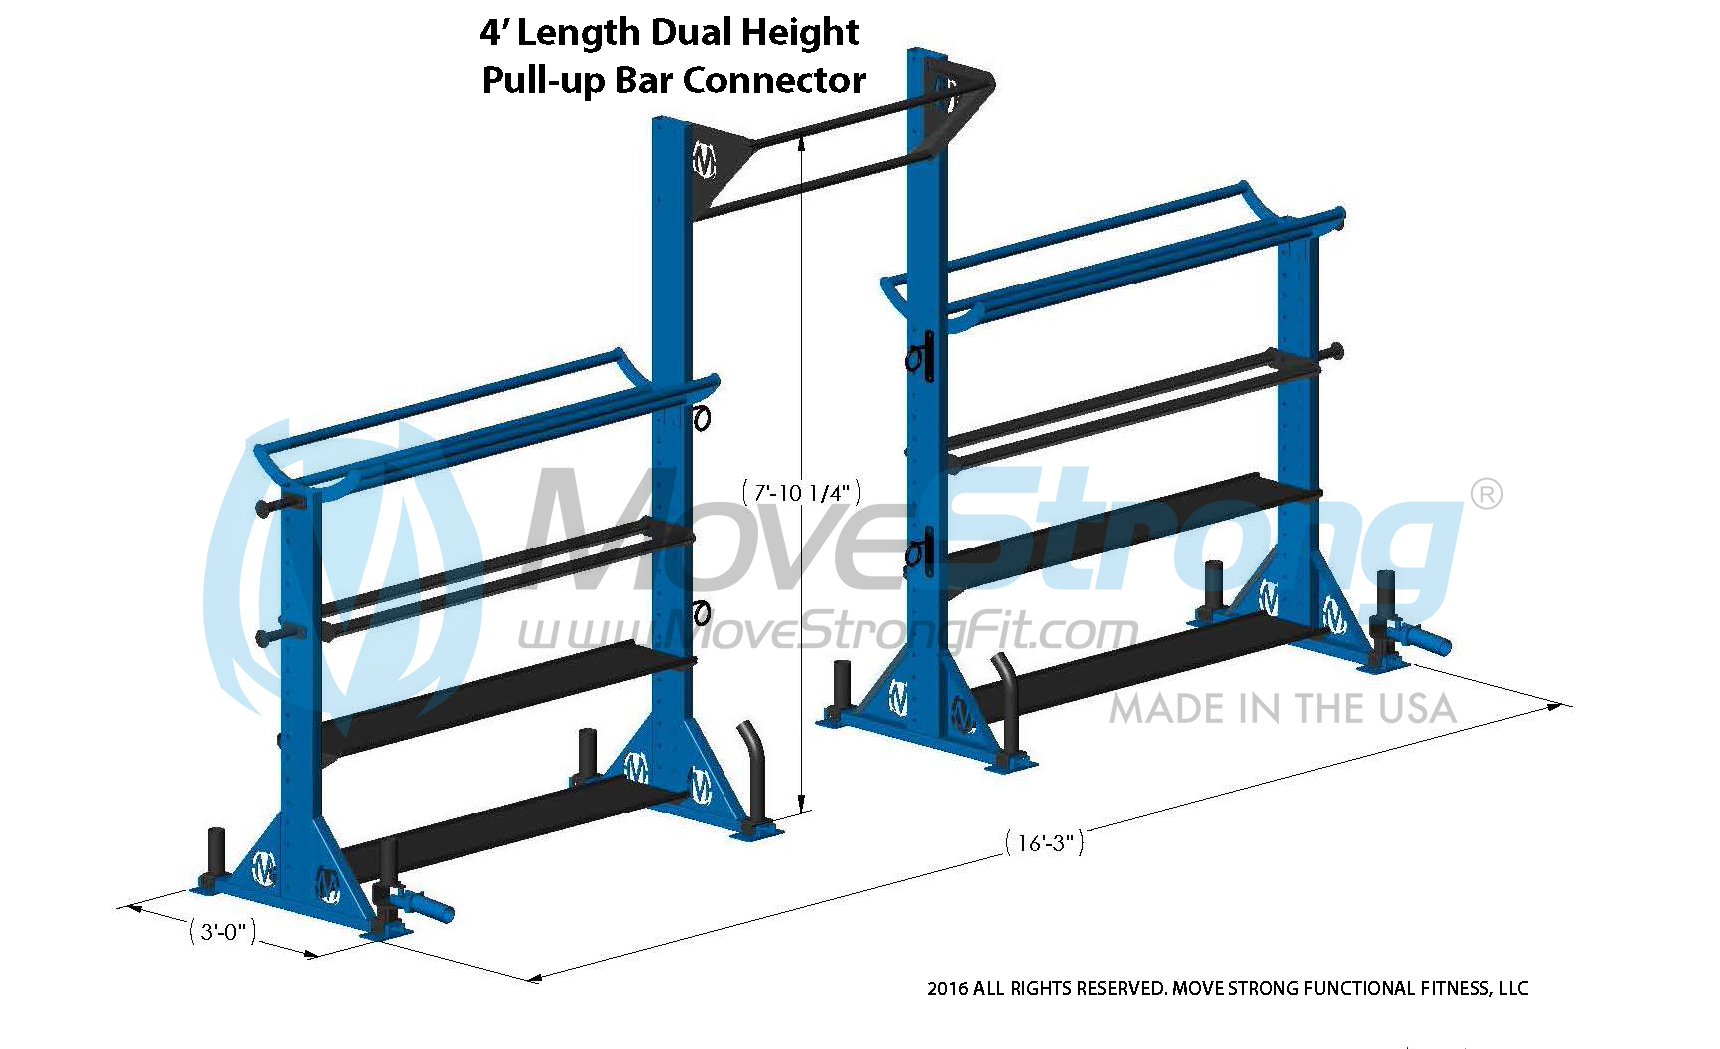 WEB IMAGE-WATER MARK_MSR-157 Spec Sheet_Dual Elite Storage_4' pull-up bar _Page_1.jpg